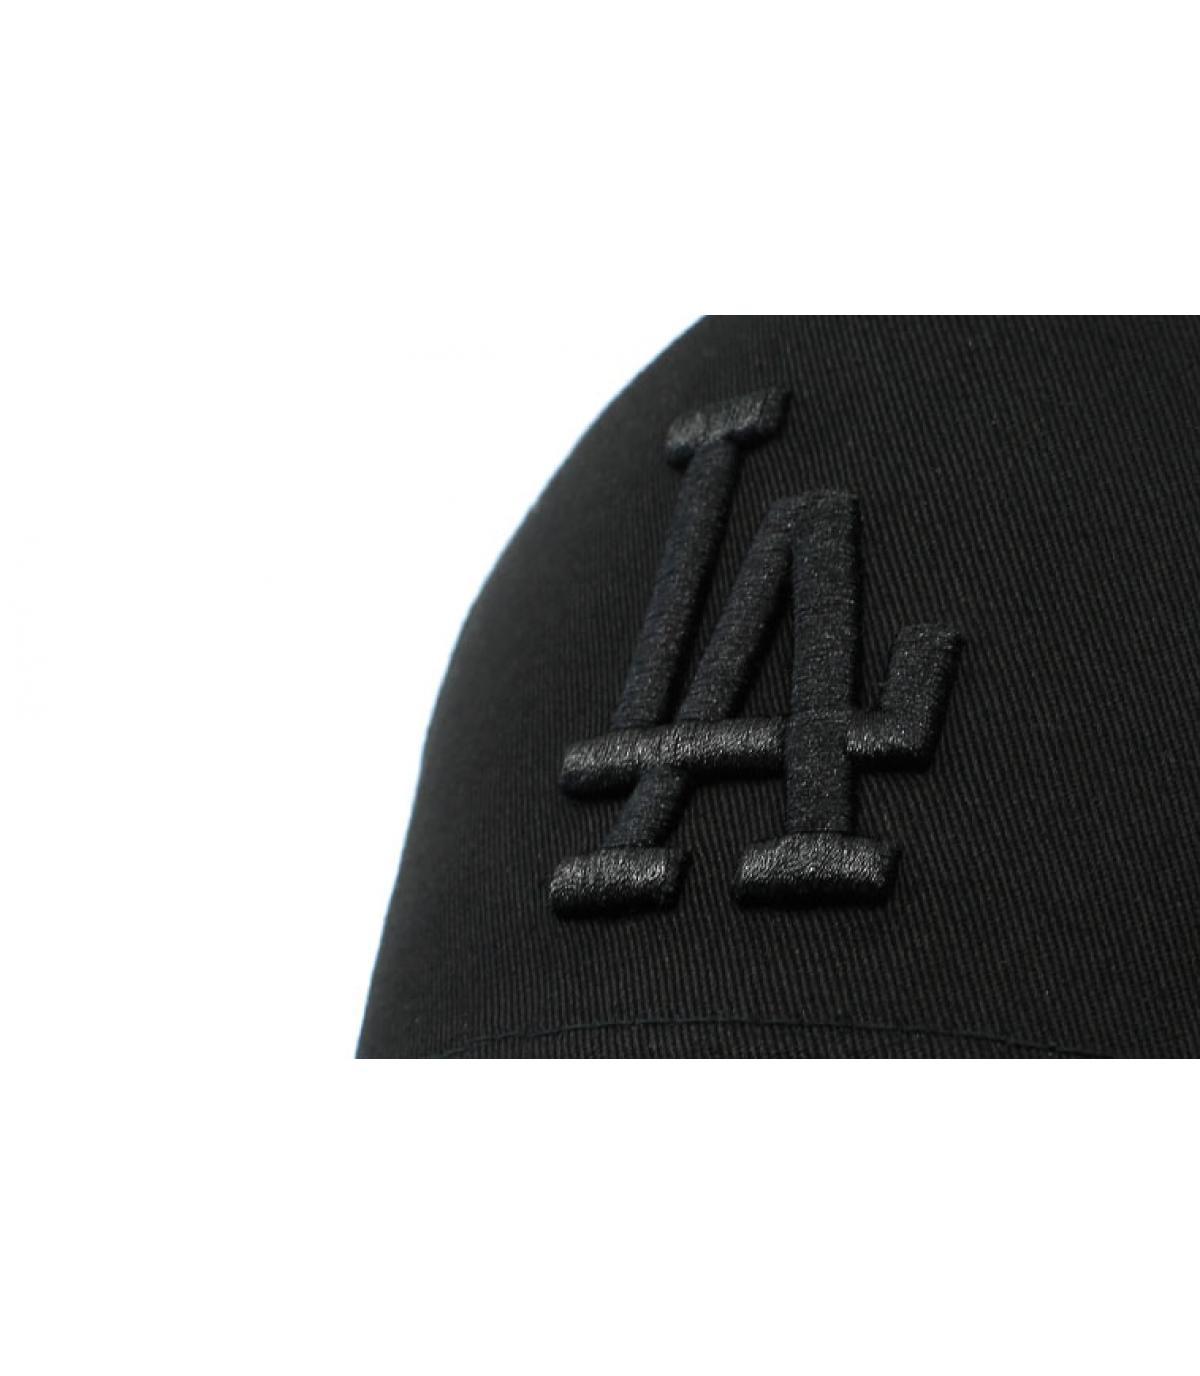 Details League Ess LA Aframe blackl - afbeeling 3